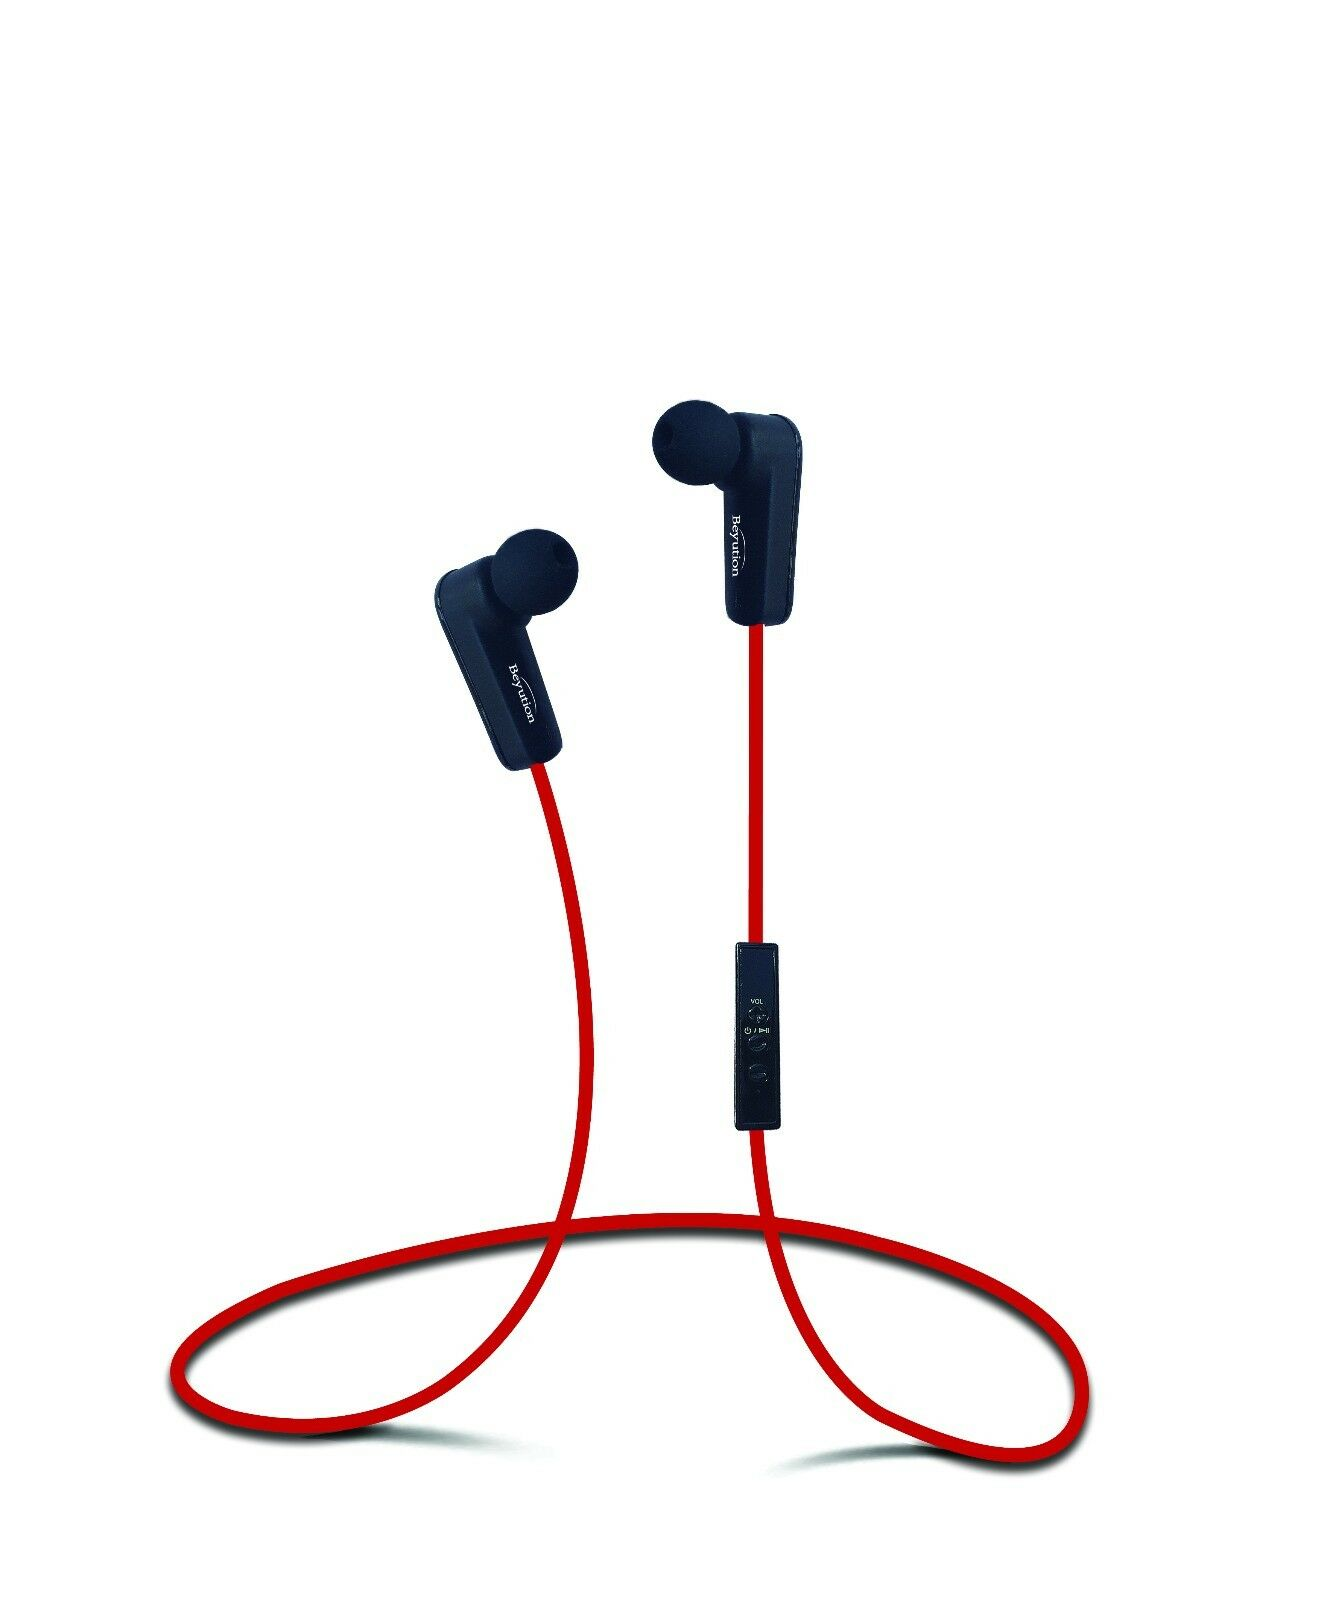 HiFi Stereo Bluetooth 4.0 APT-X Wireless Headphones A2DP for